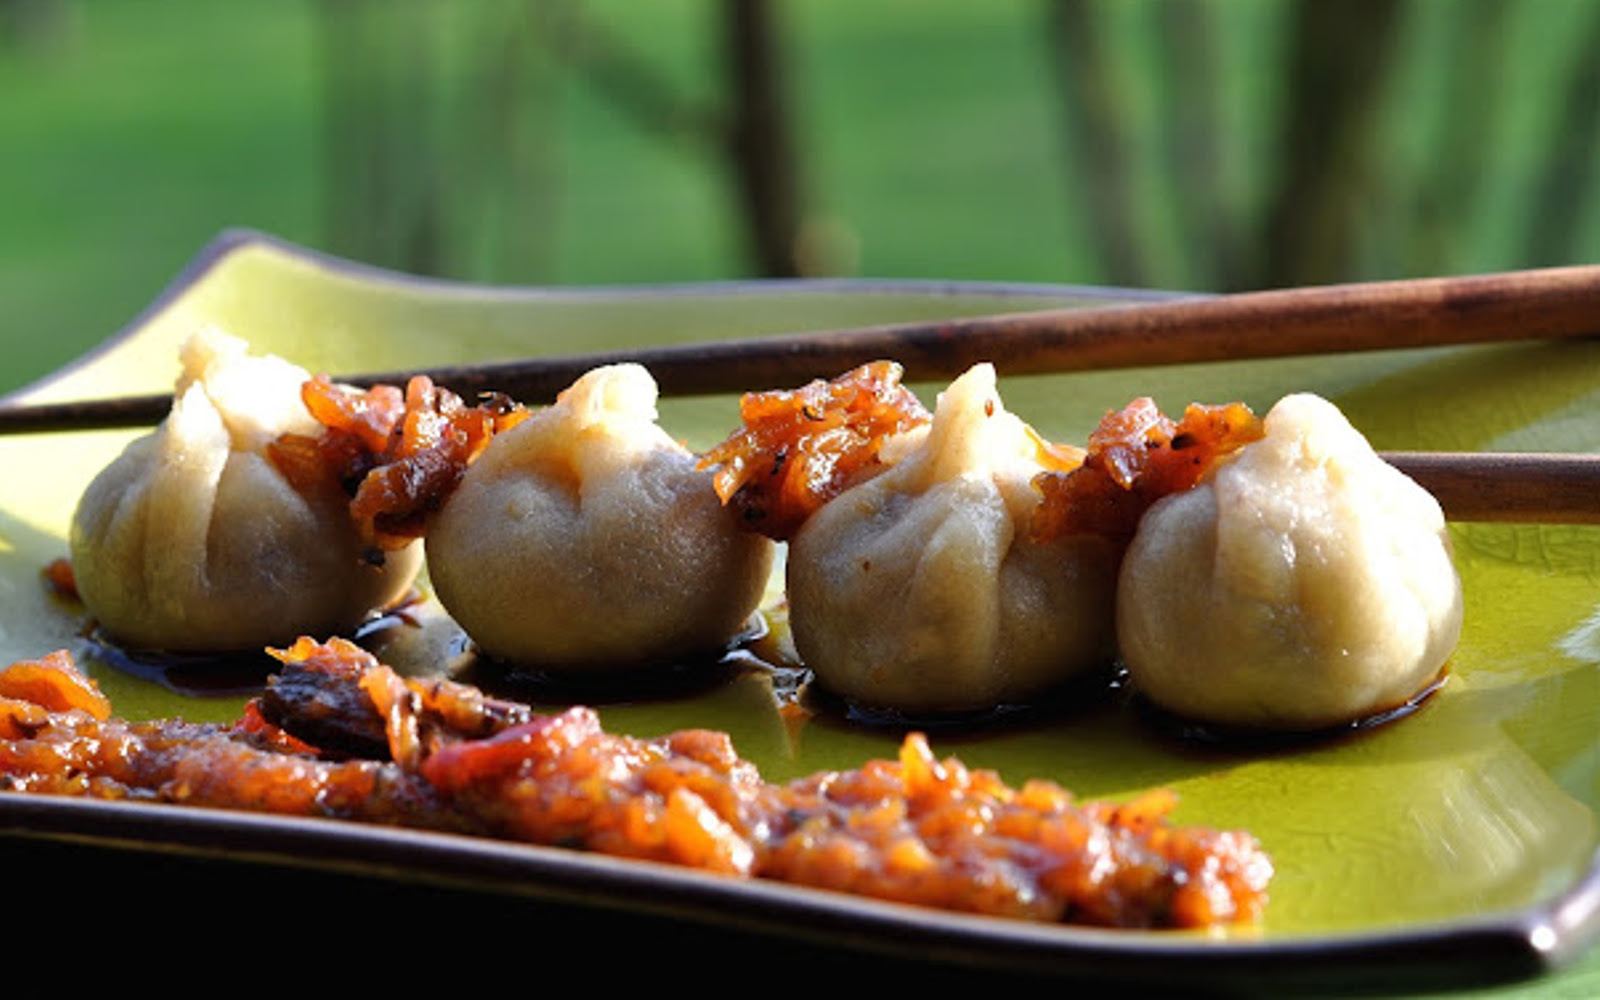 Vegan Momo: South Asian Dumplings With Apple Chutney